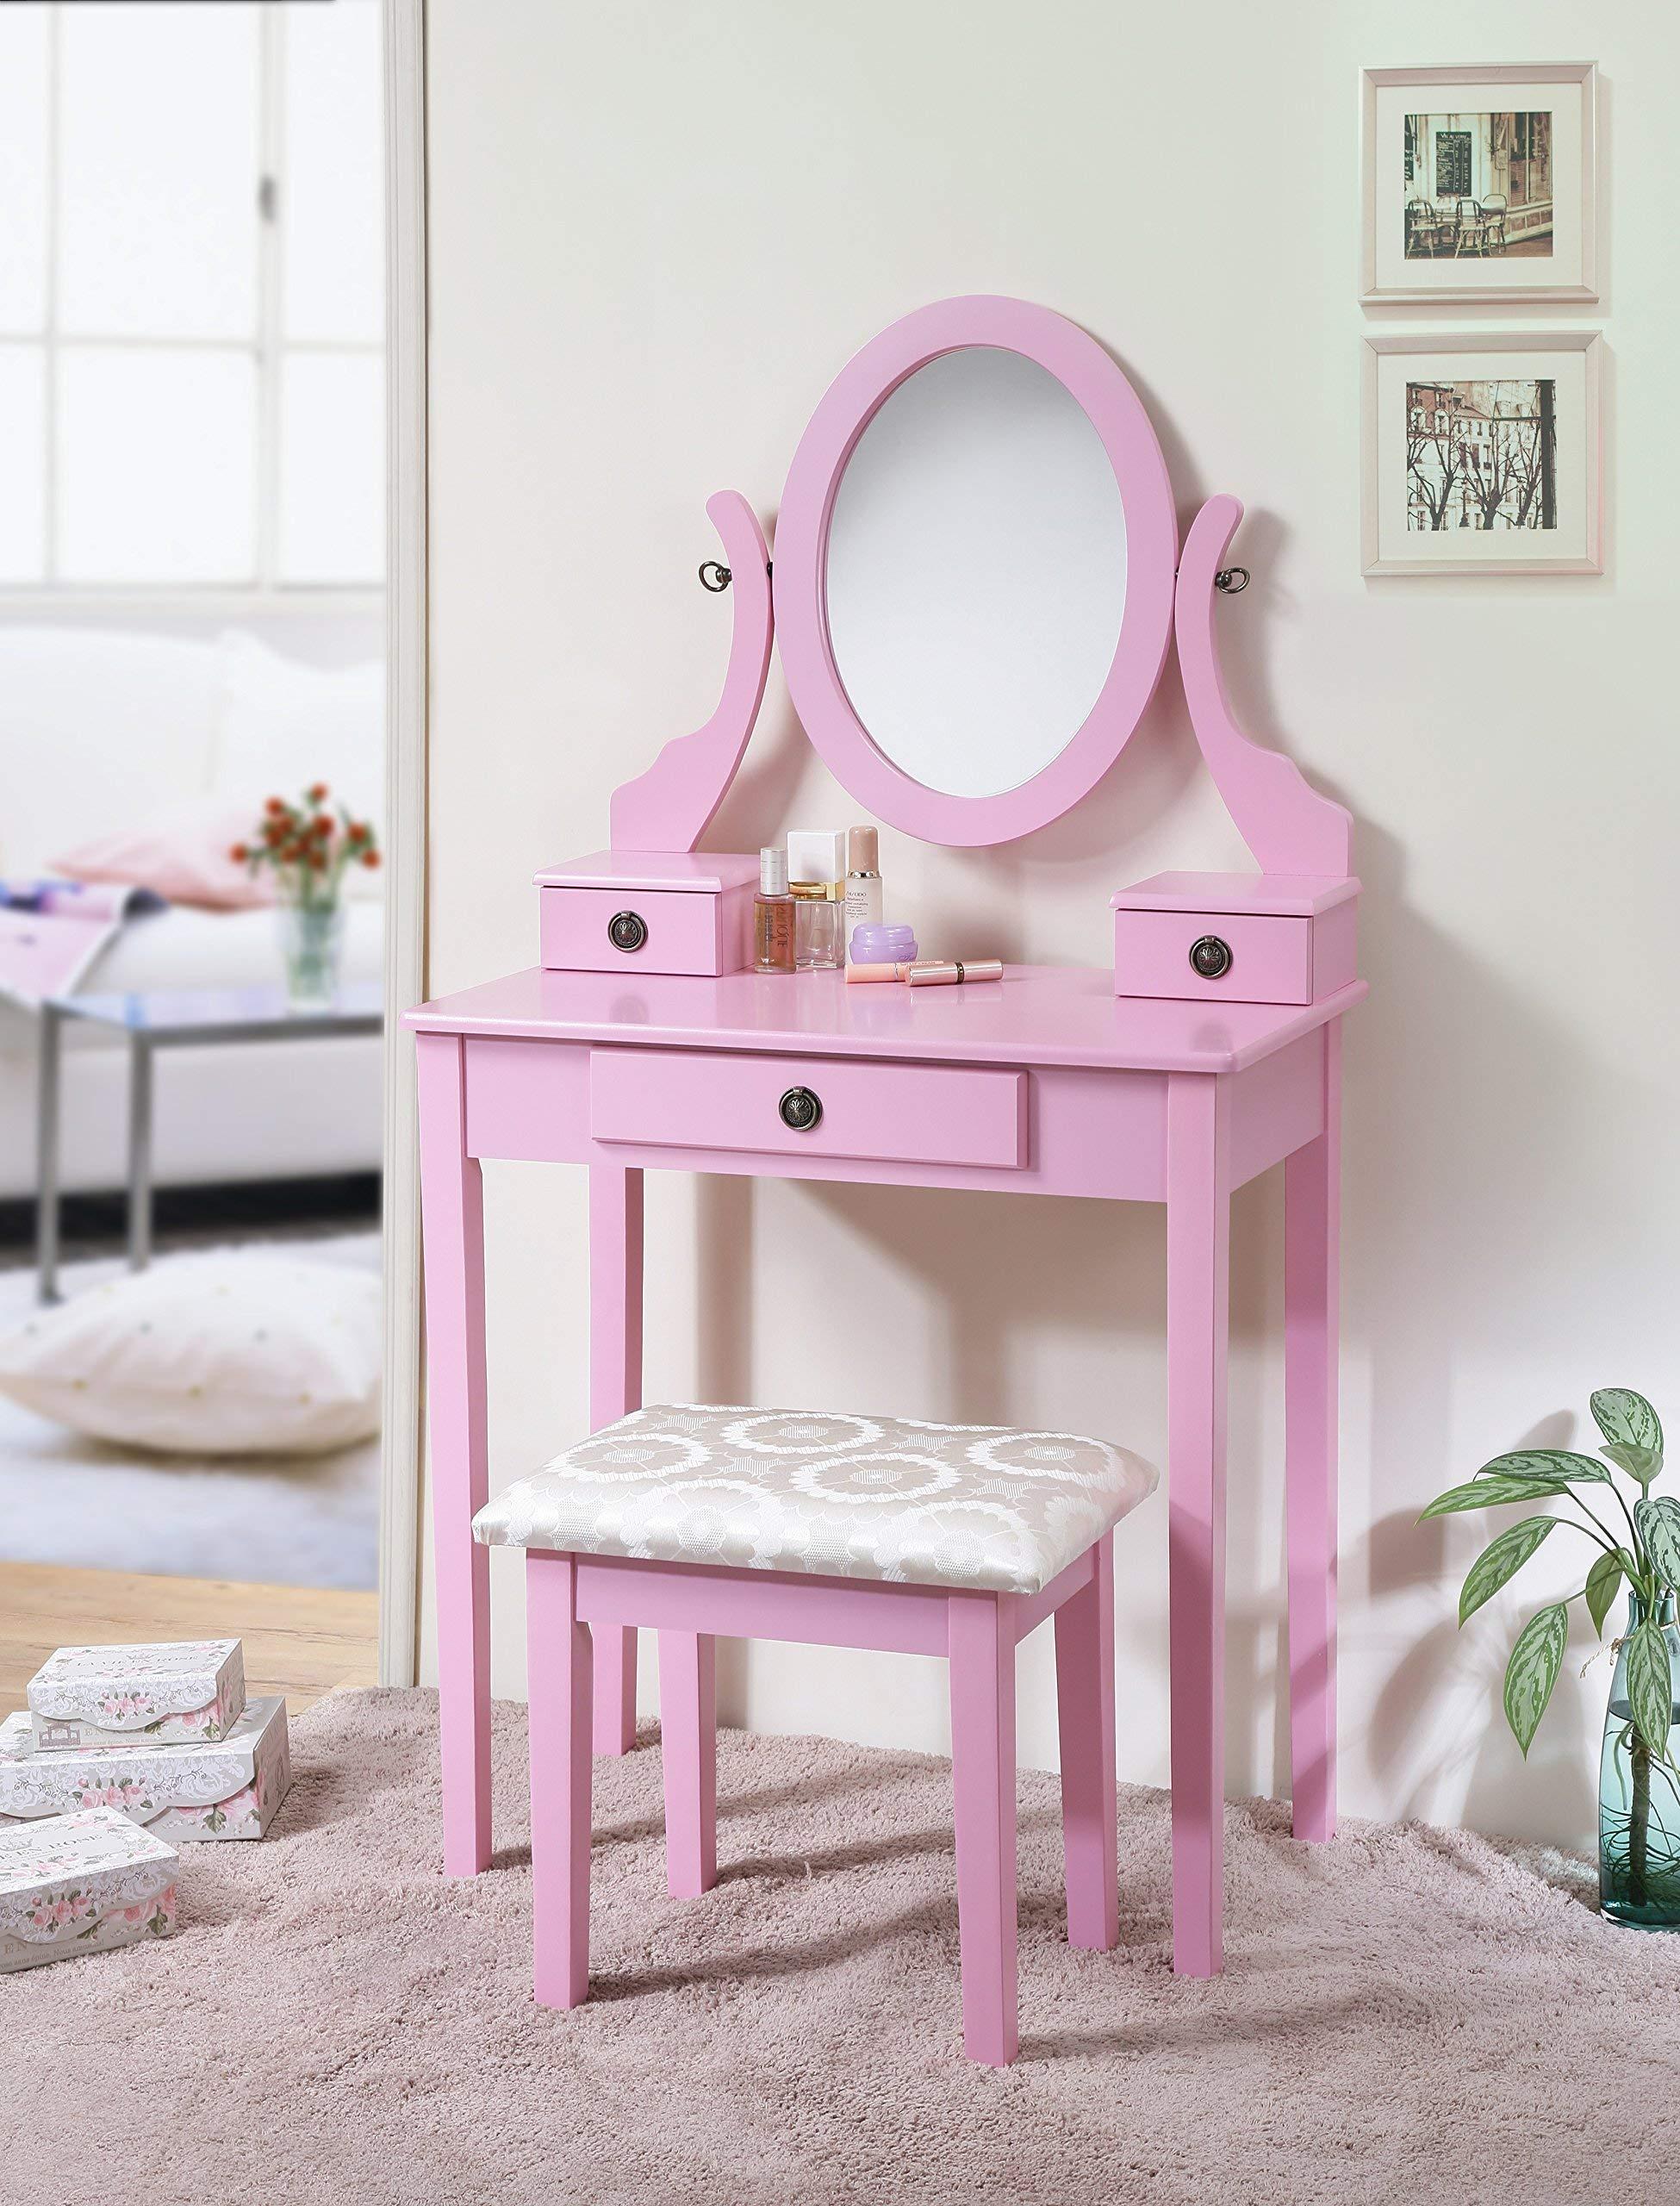 Roundhill Furniture 3415PI Moniys Moniya Pink Wood Makeup Vanity Table and Stool Set by Roundhill Furniture